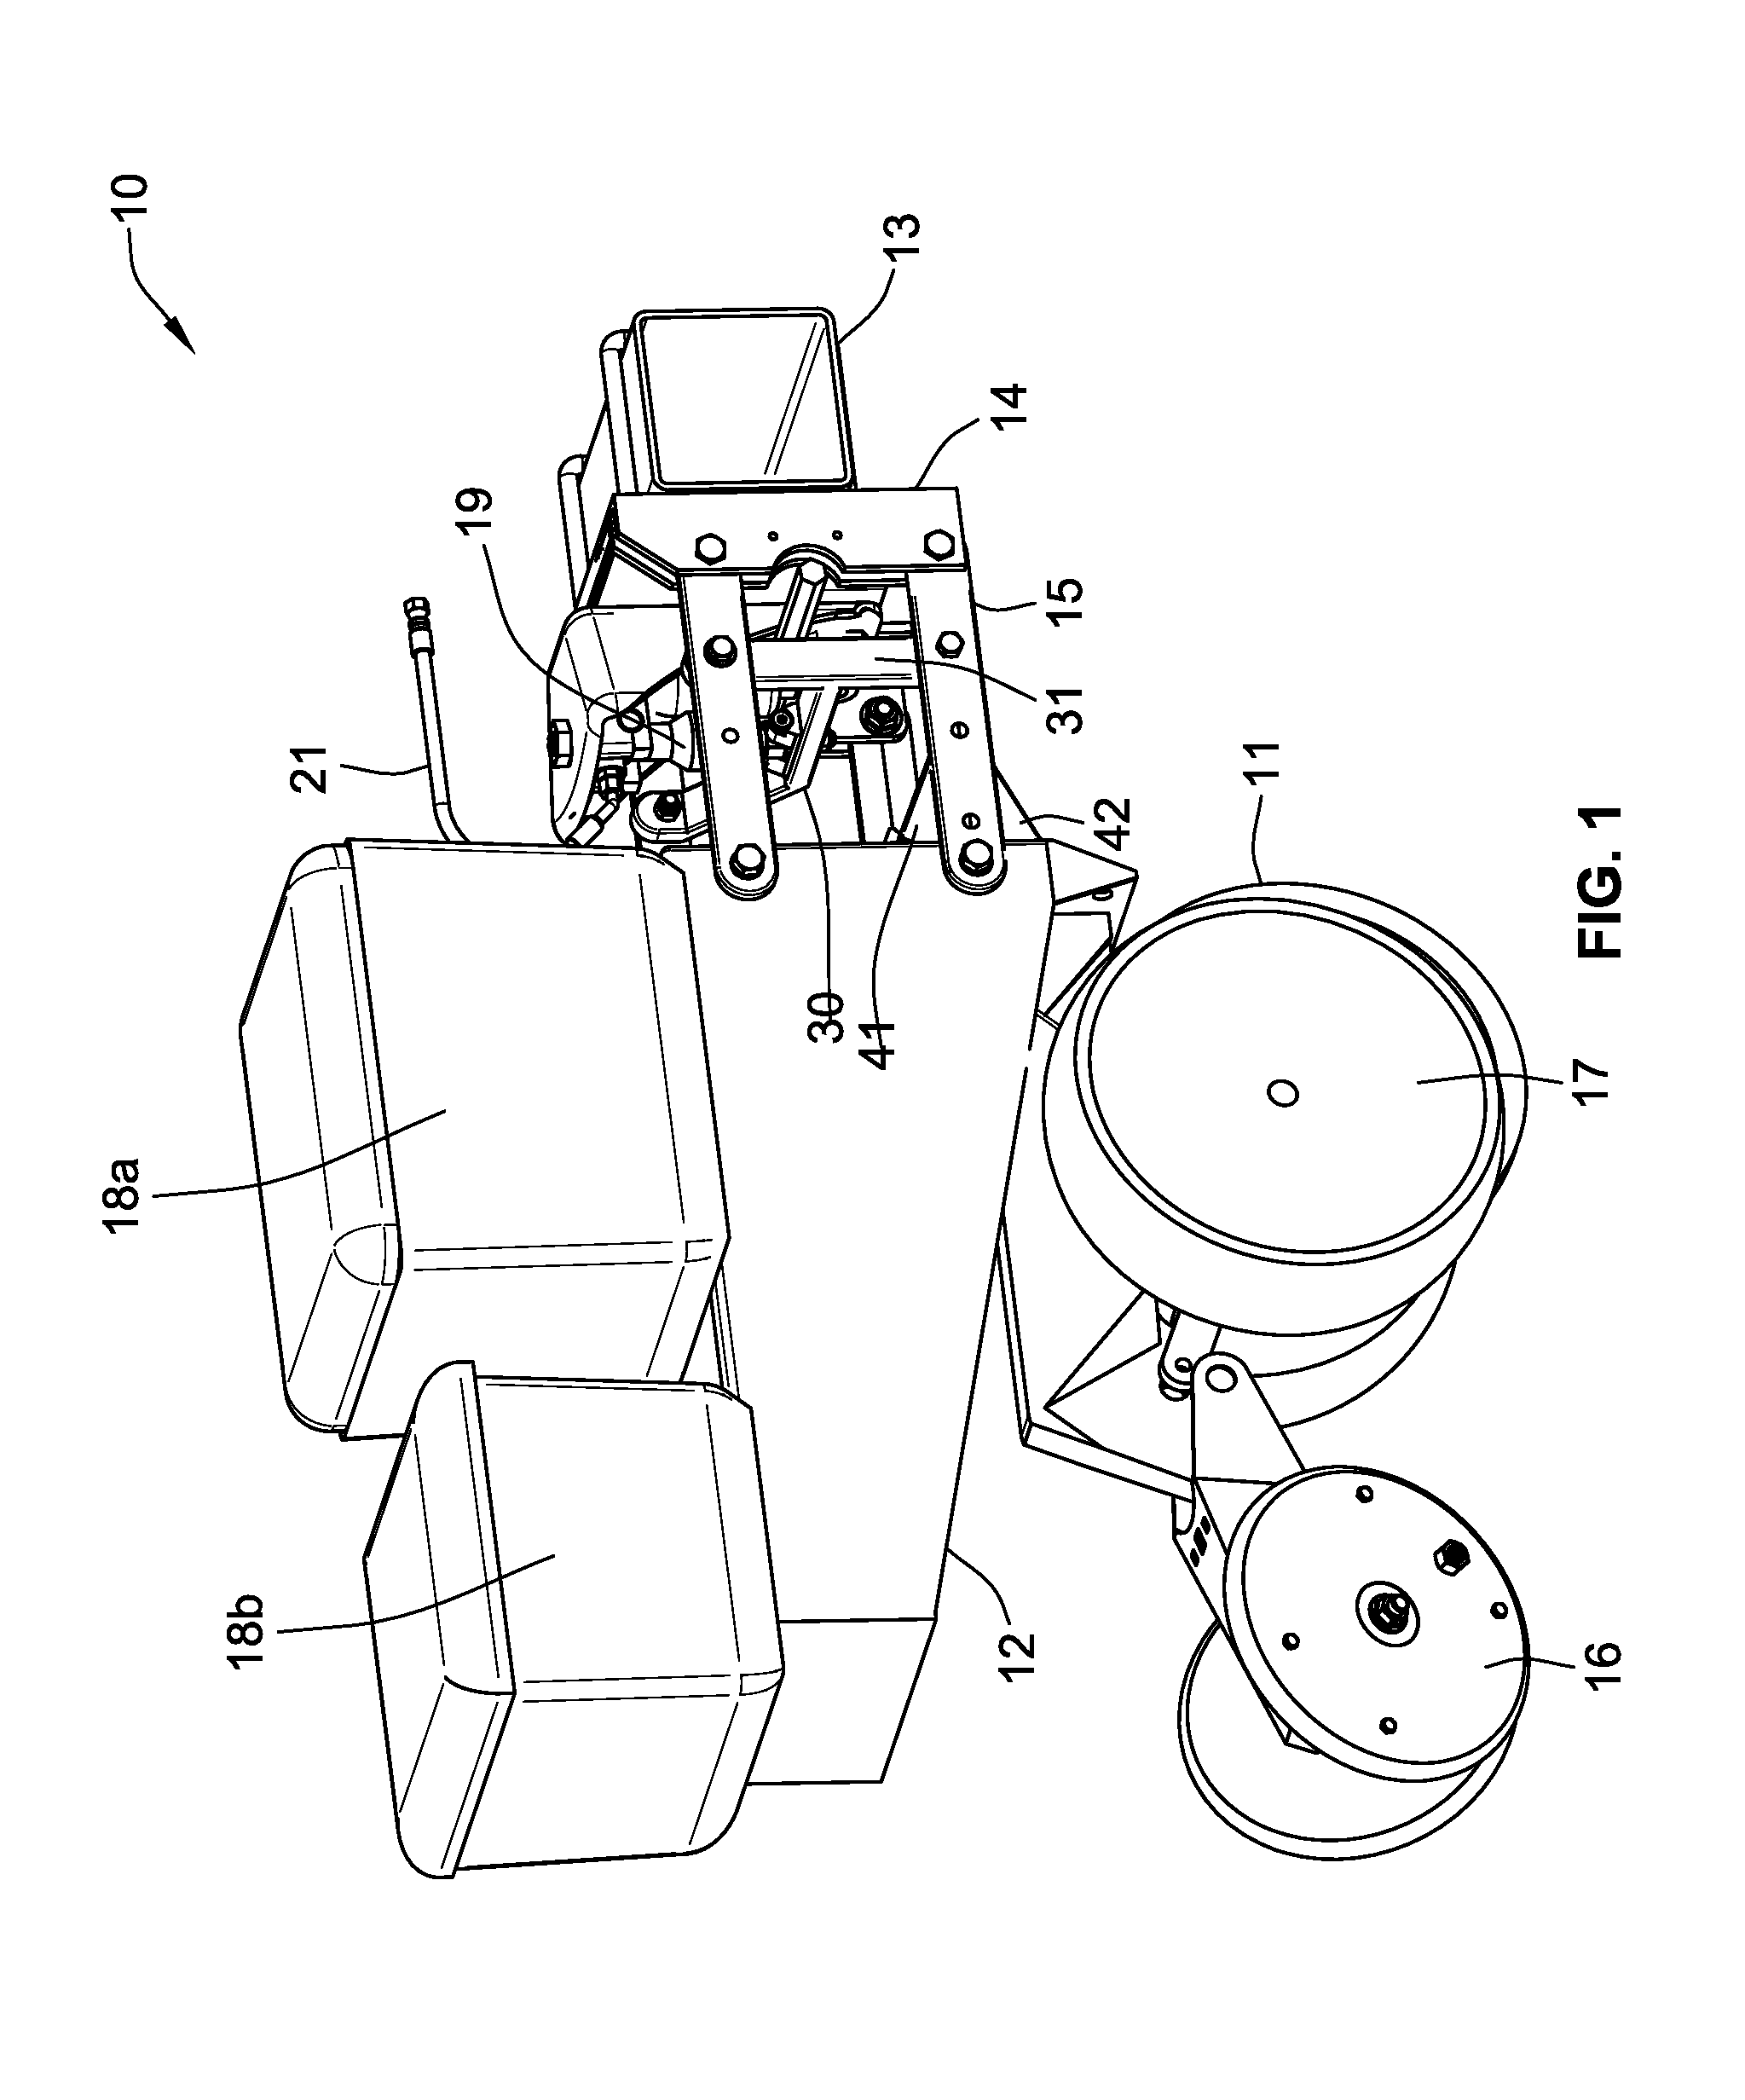 2008 Nissan Versa Stereo Wiring Diagram Moreover Dodge Ram 1500 Wiring